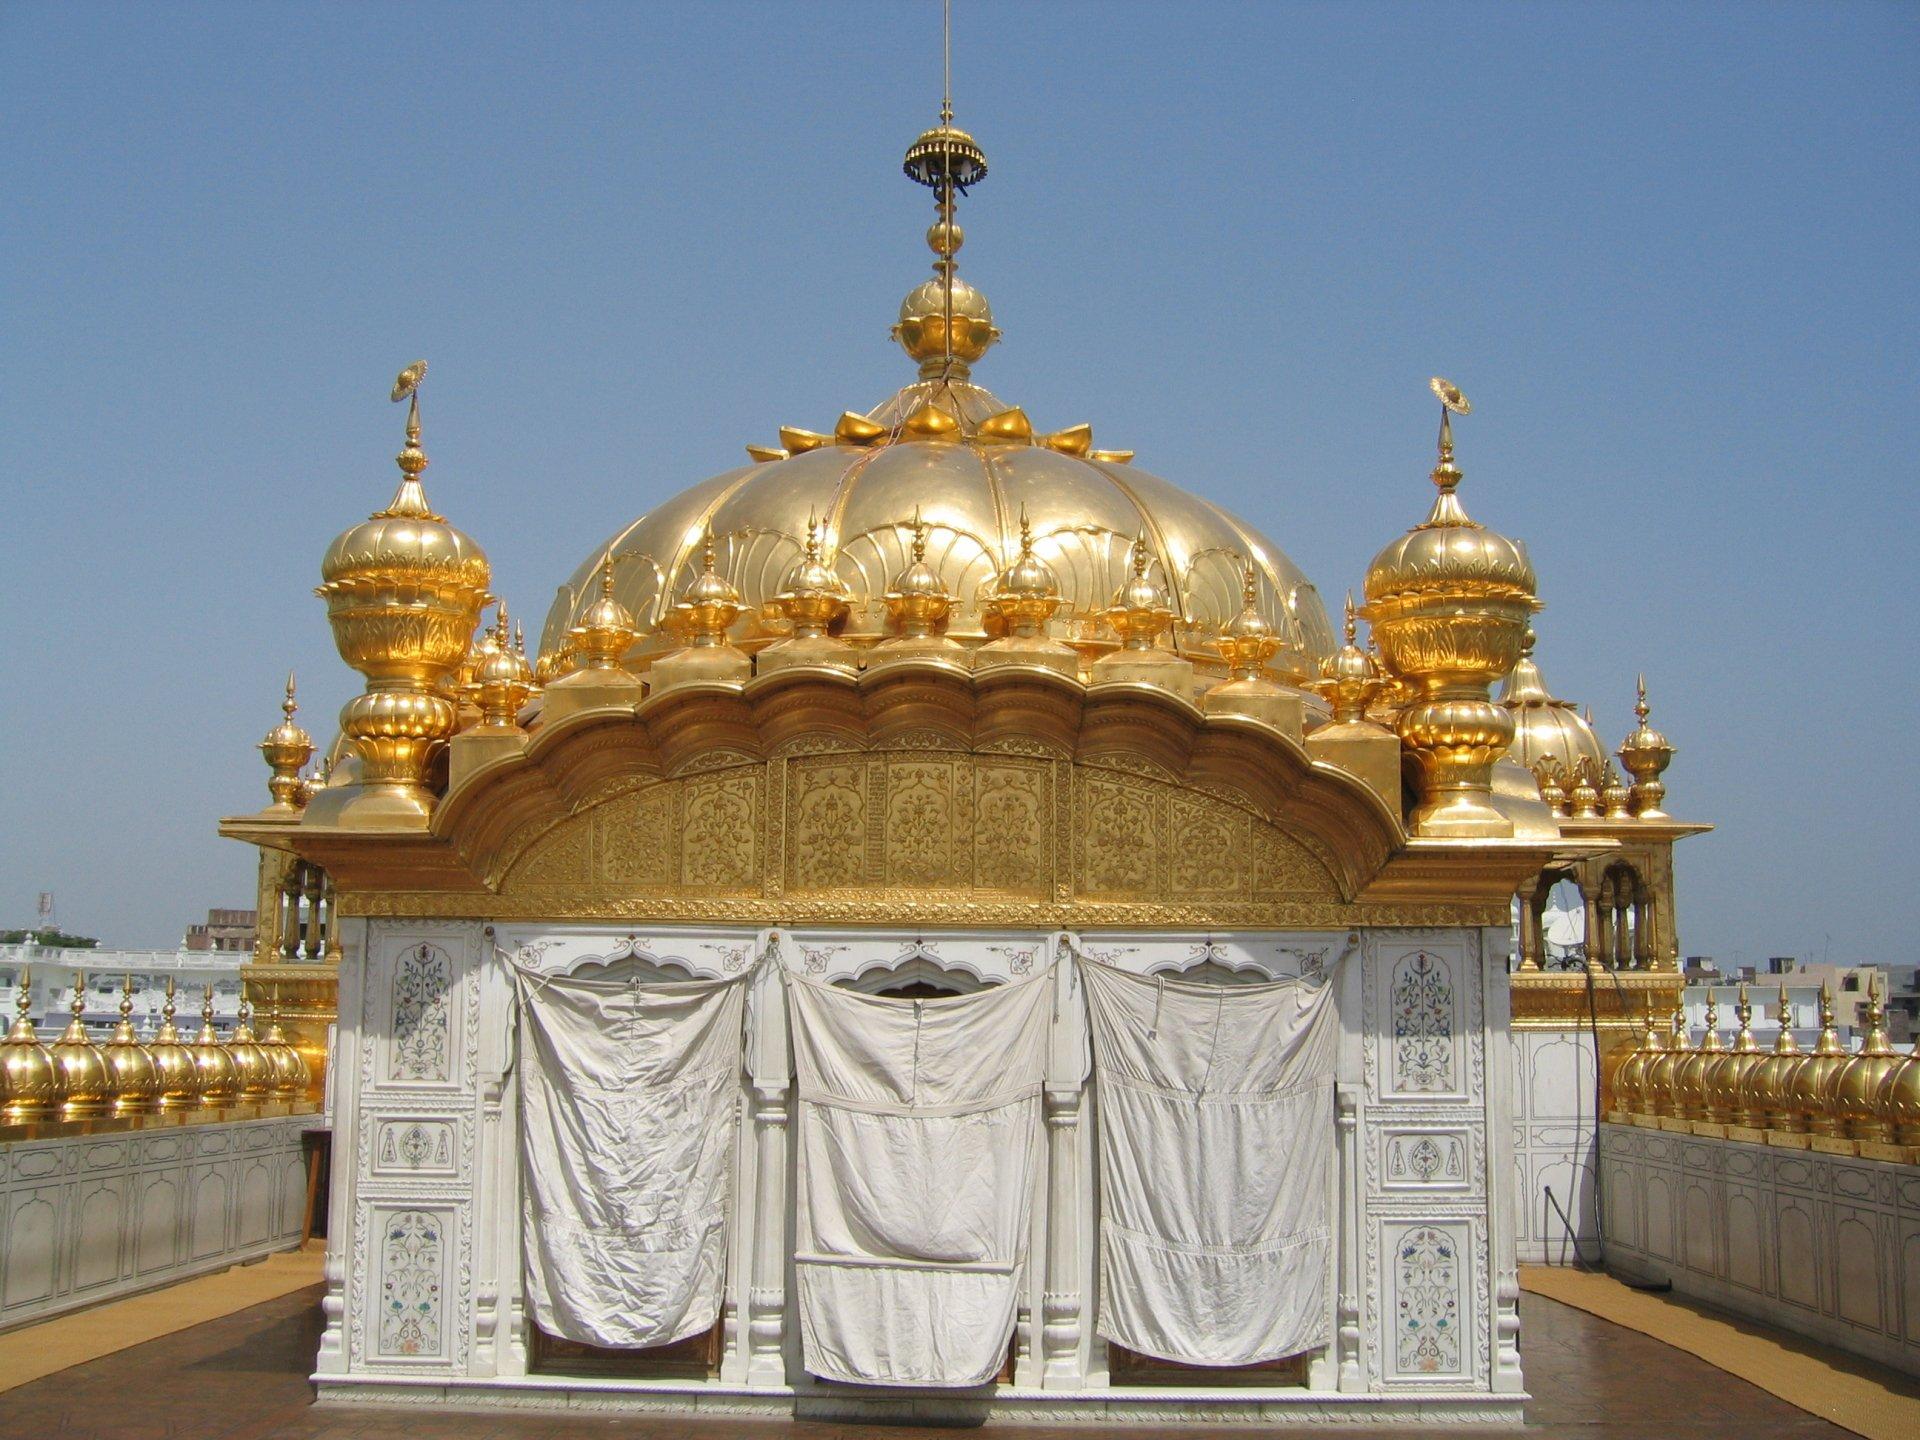 Sikh Wallpapers Hd For Iphone 5 Hamandir Sahib The Golden Temple Amritsar Punjab Hd